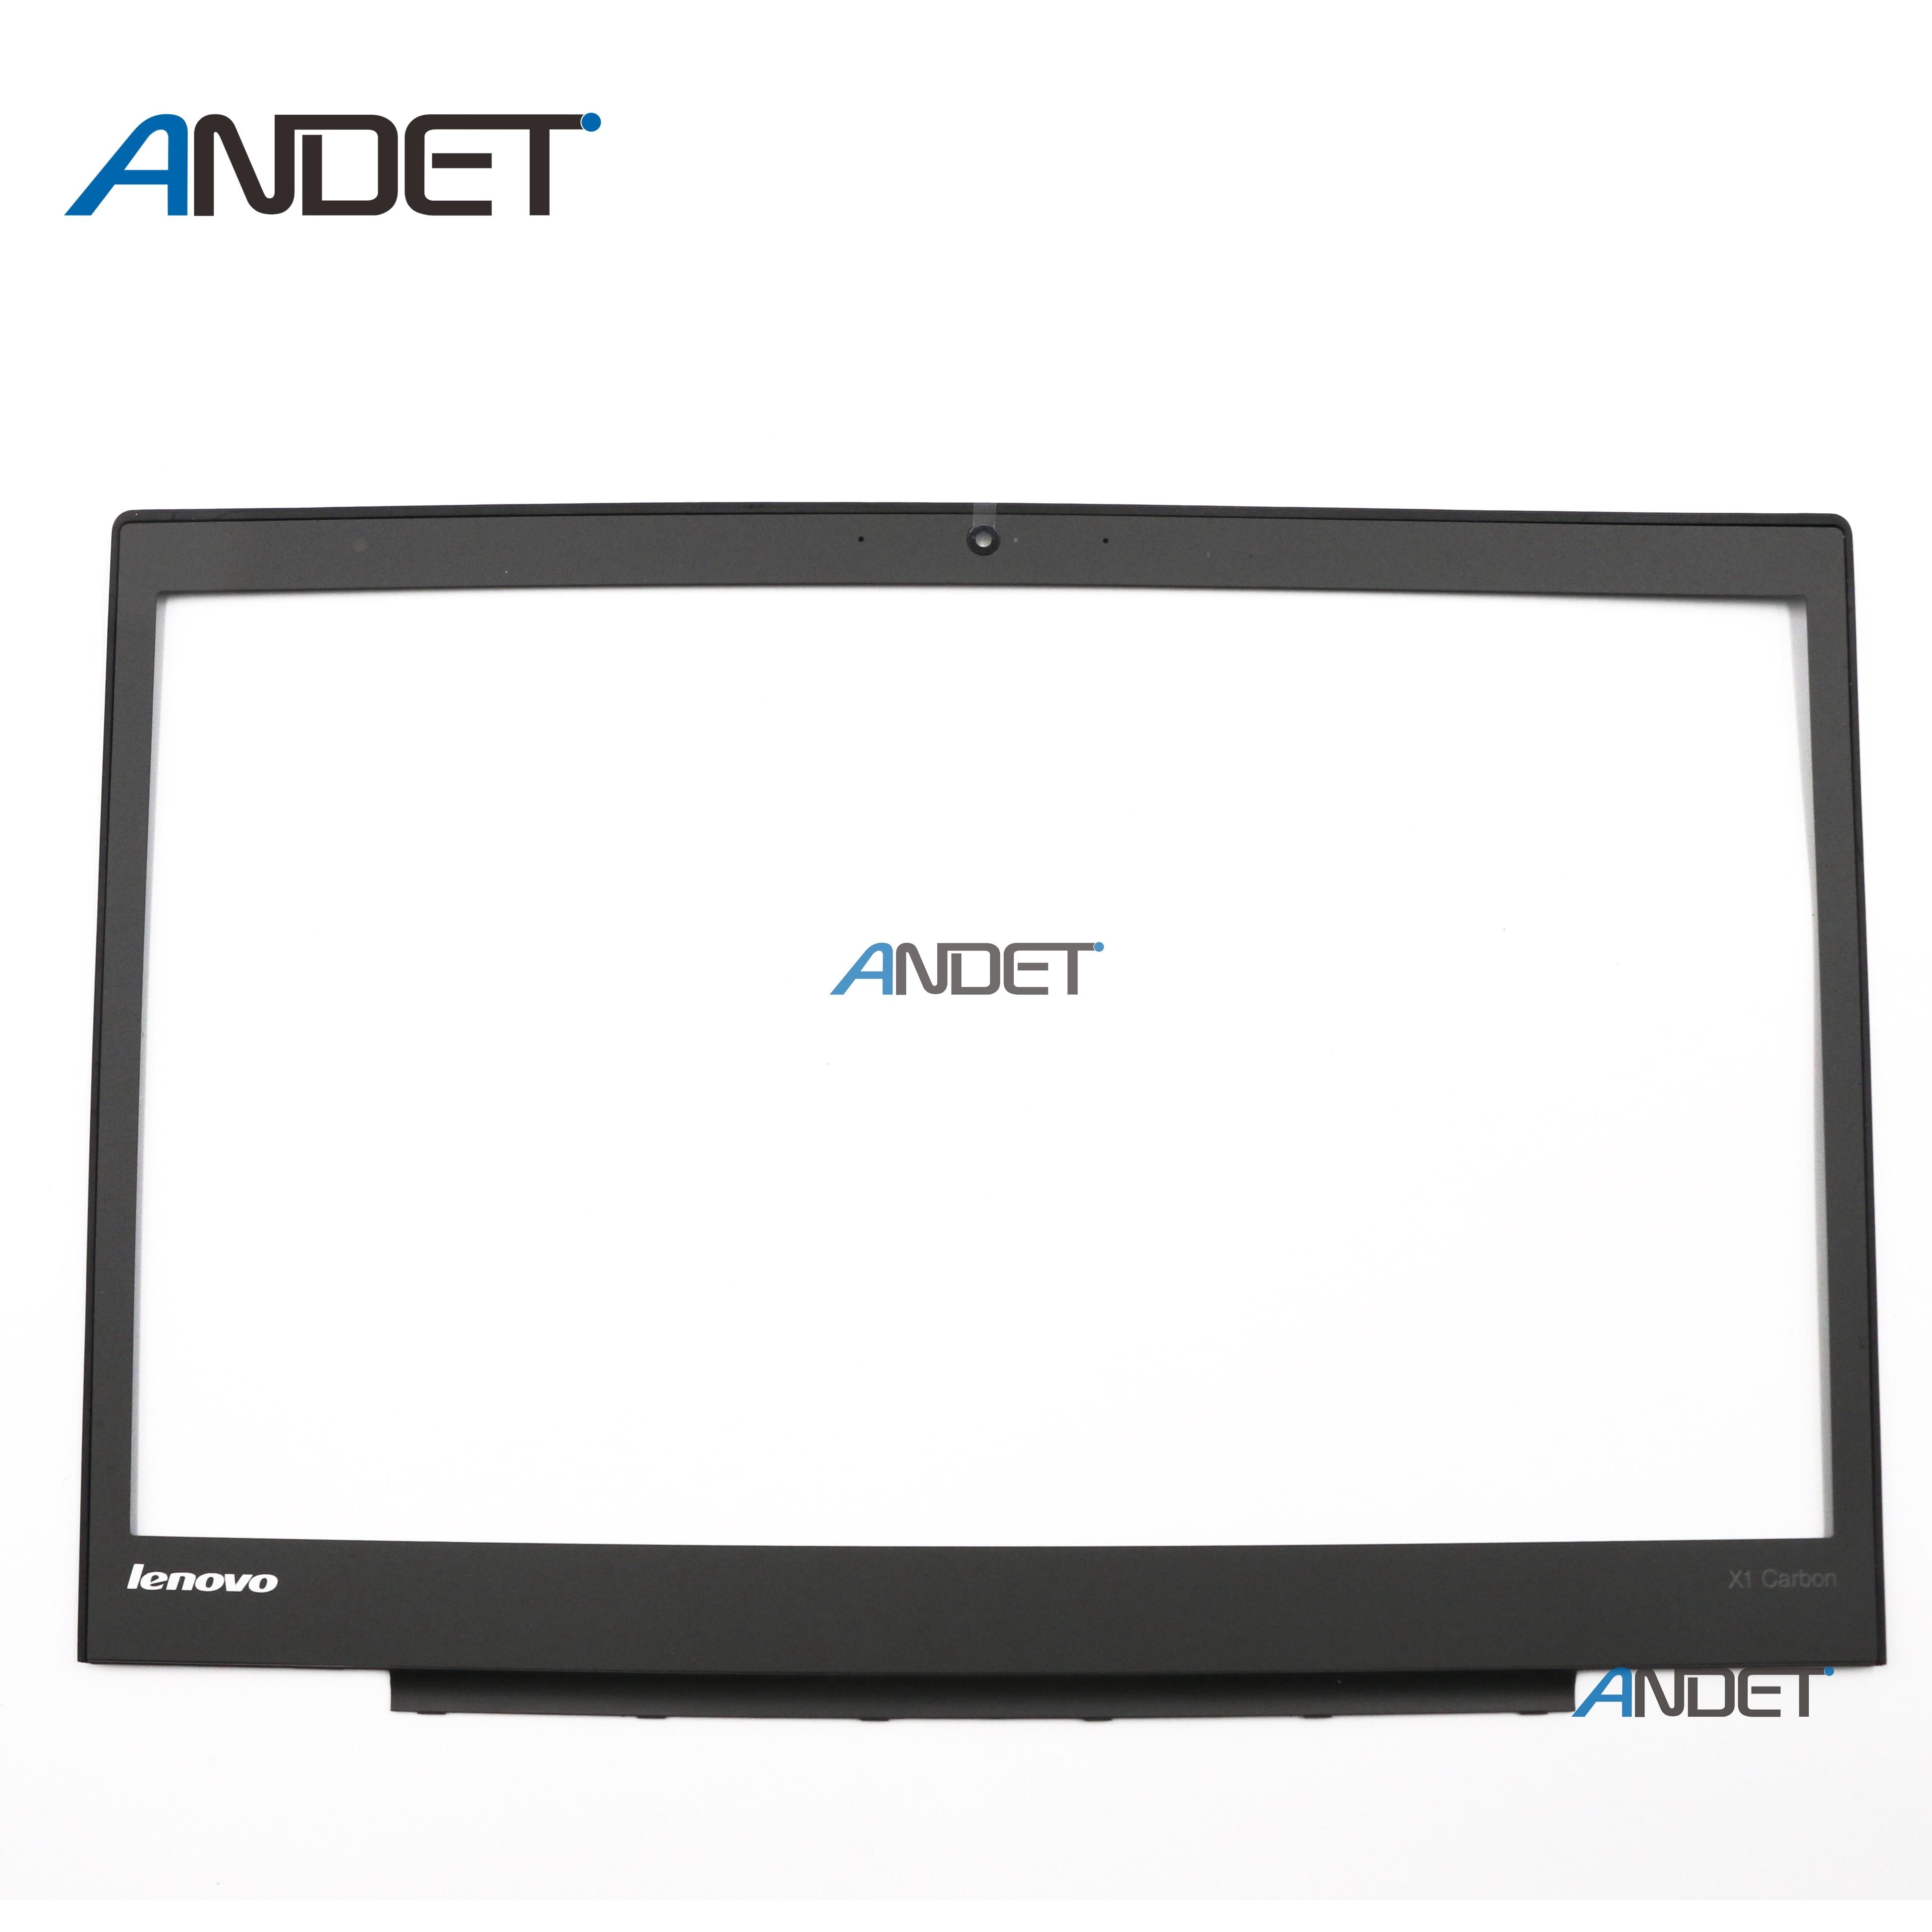 Новый оригинальный для lenovo ThinkPad X1 Carbon 2nd 3rd Gen 20A7 20A8 20BS 20B ЖК передняя рамка Крышка без касания 2560*1440 WQHD 04X5569